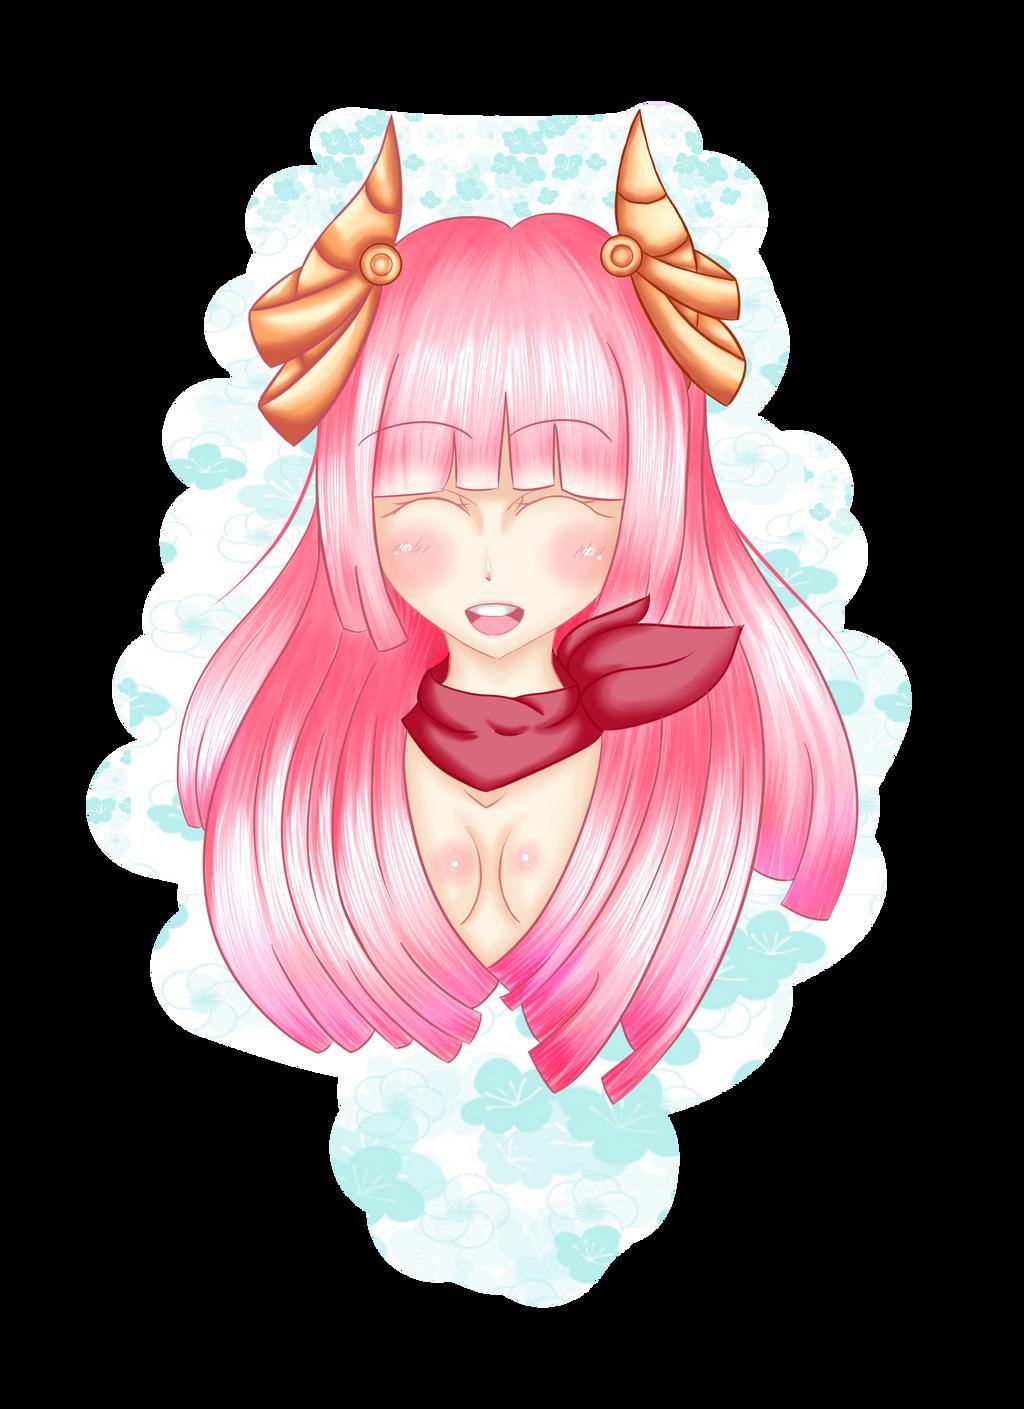 Smile Amy~ by NoisArakis